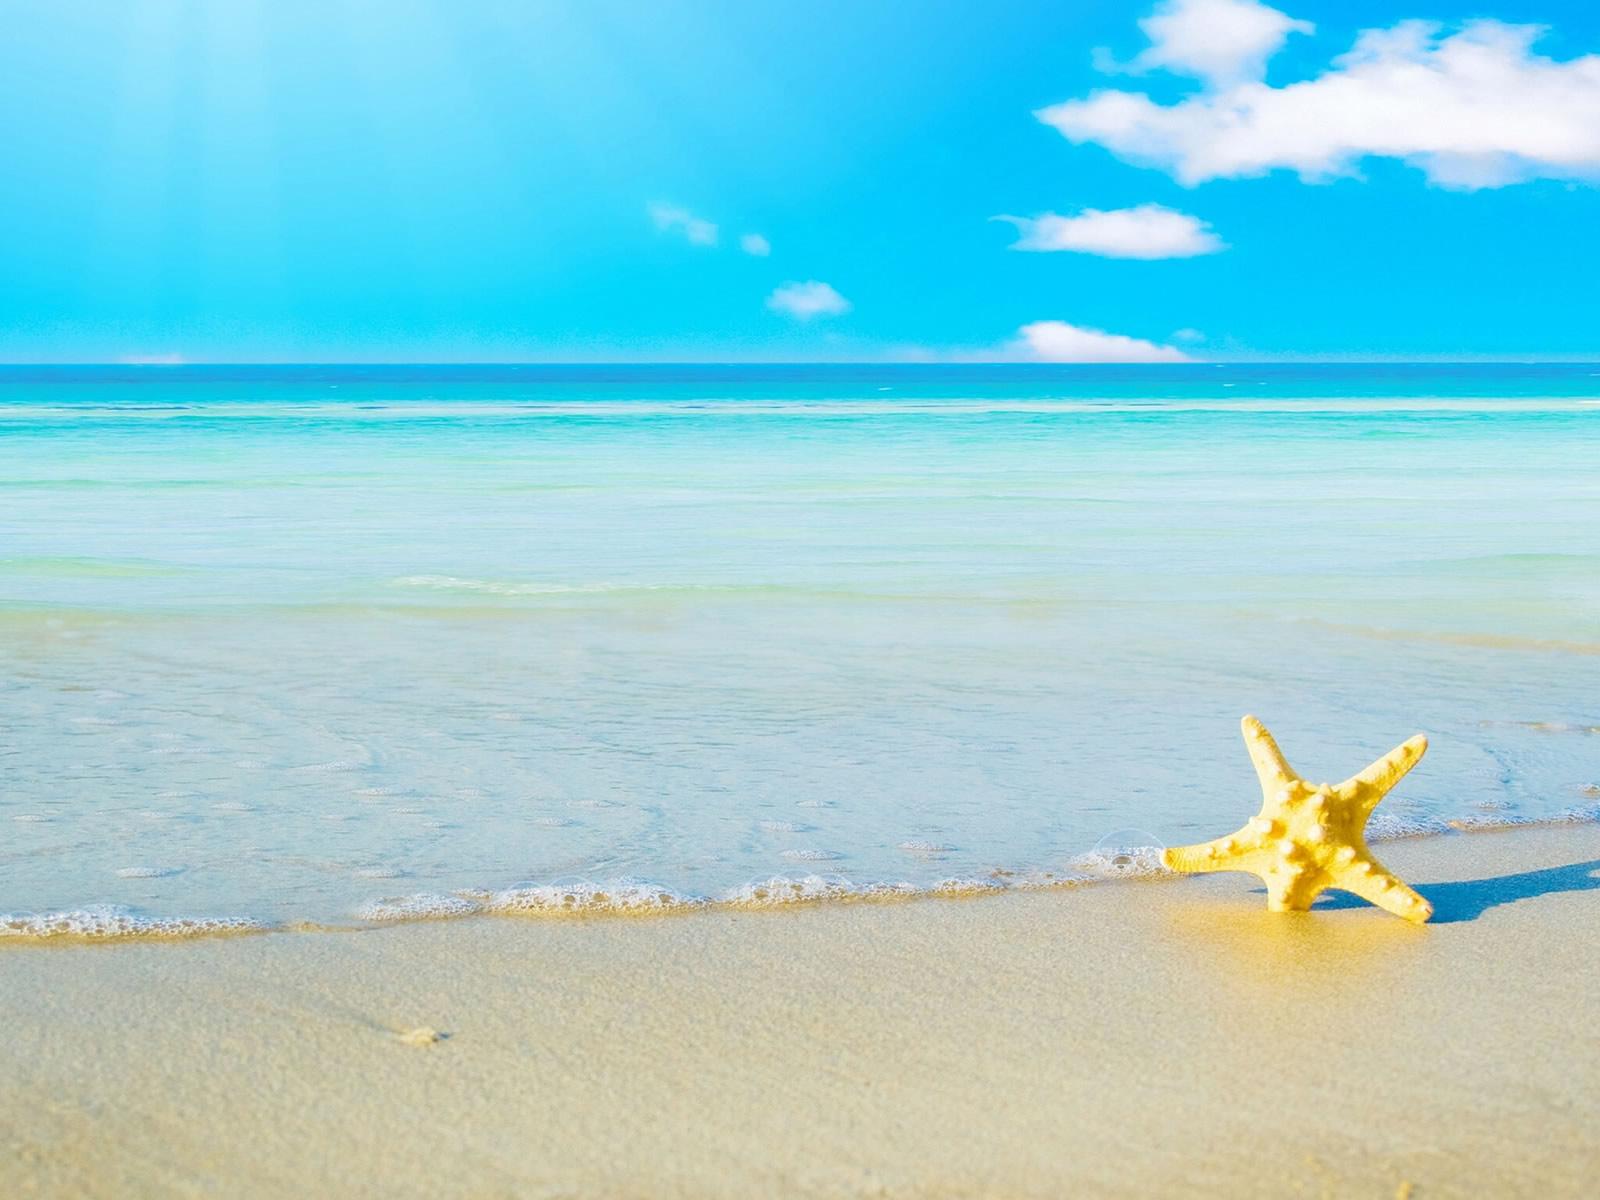 star fish sea beach sand wallpaper View All View All 1600x1200